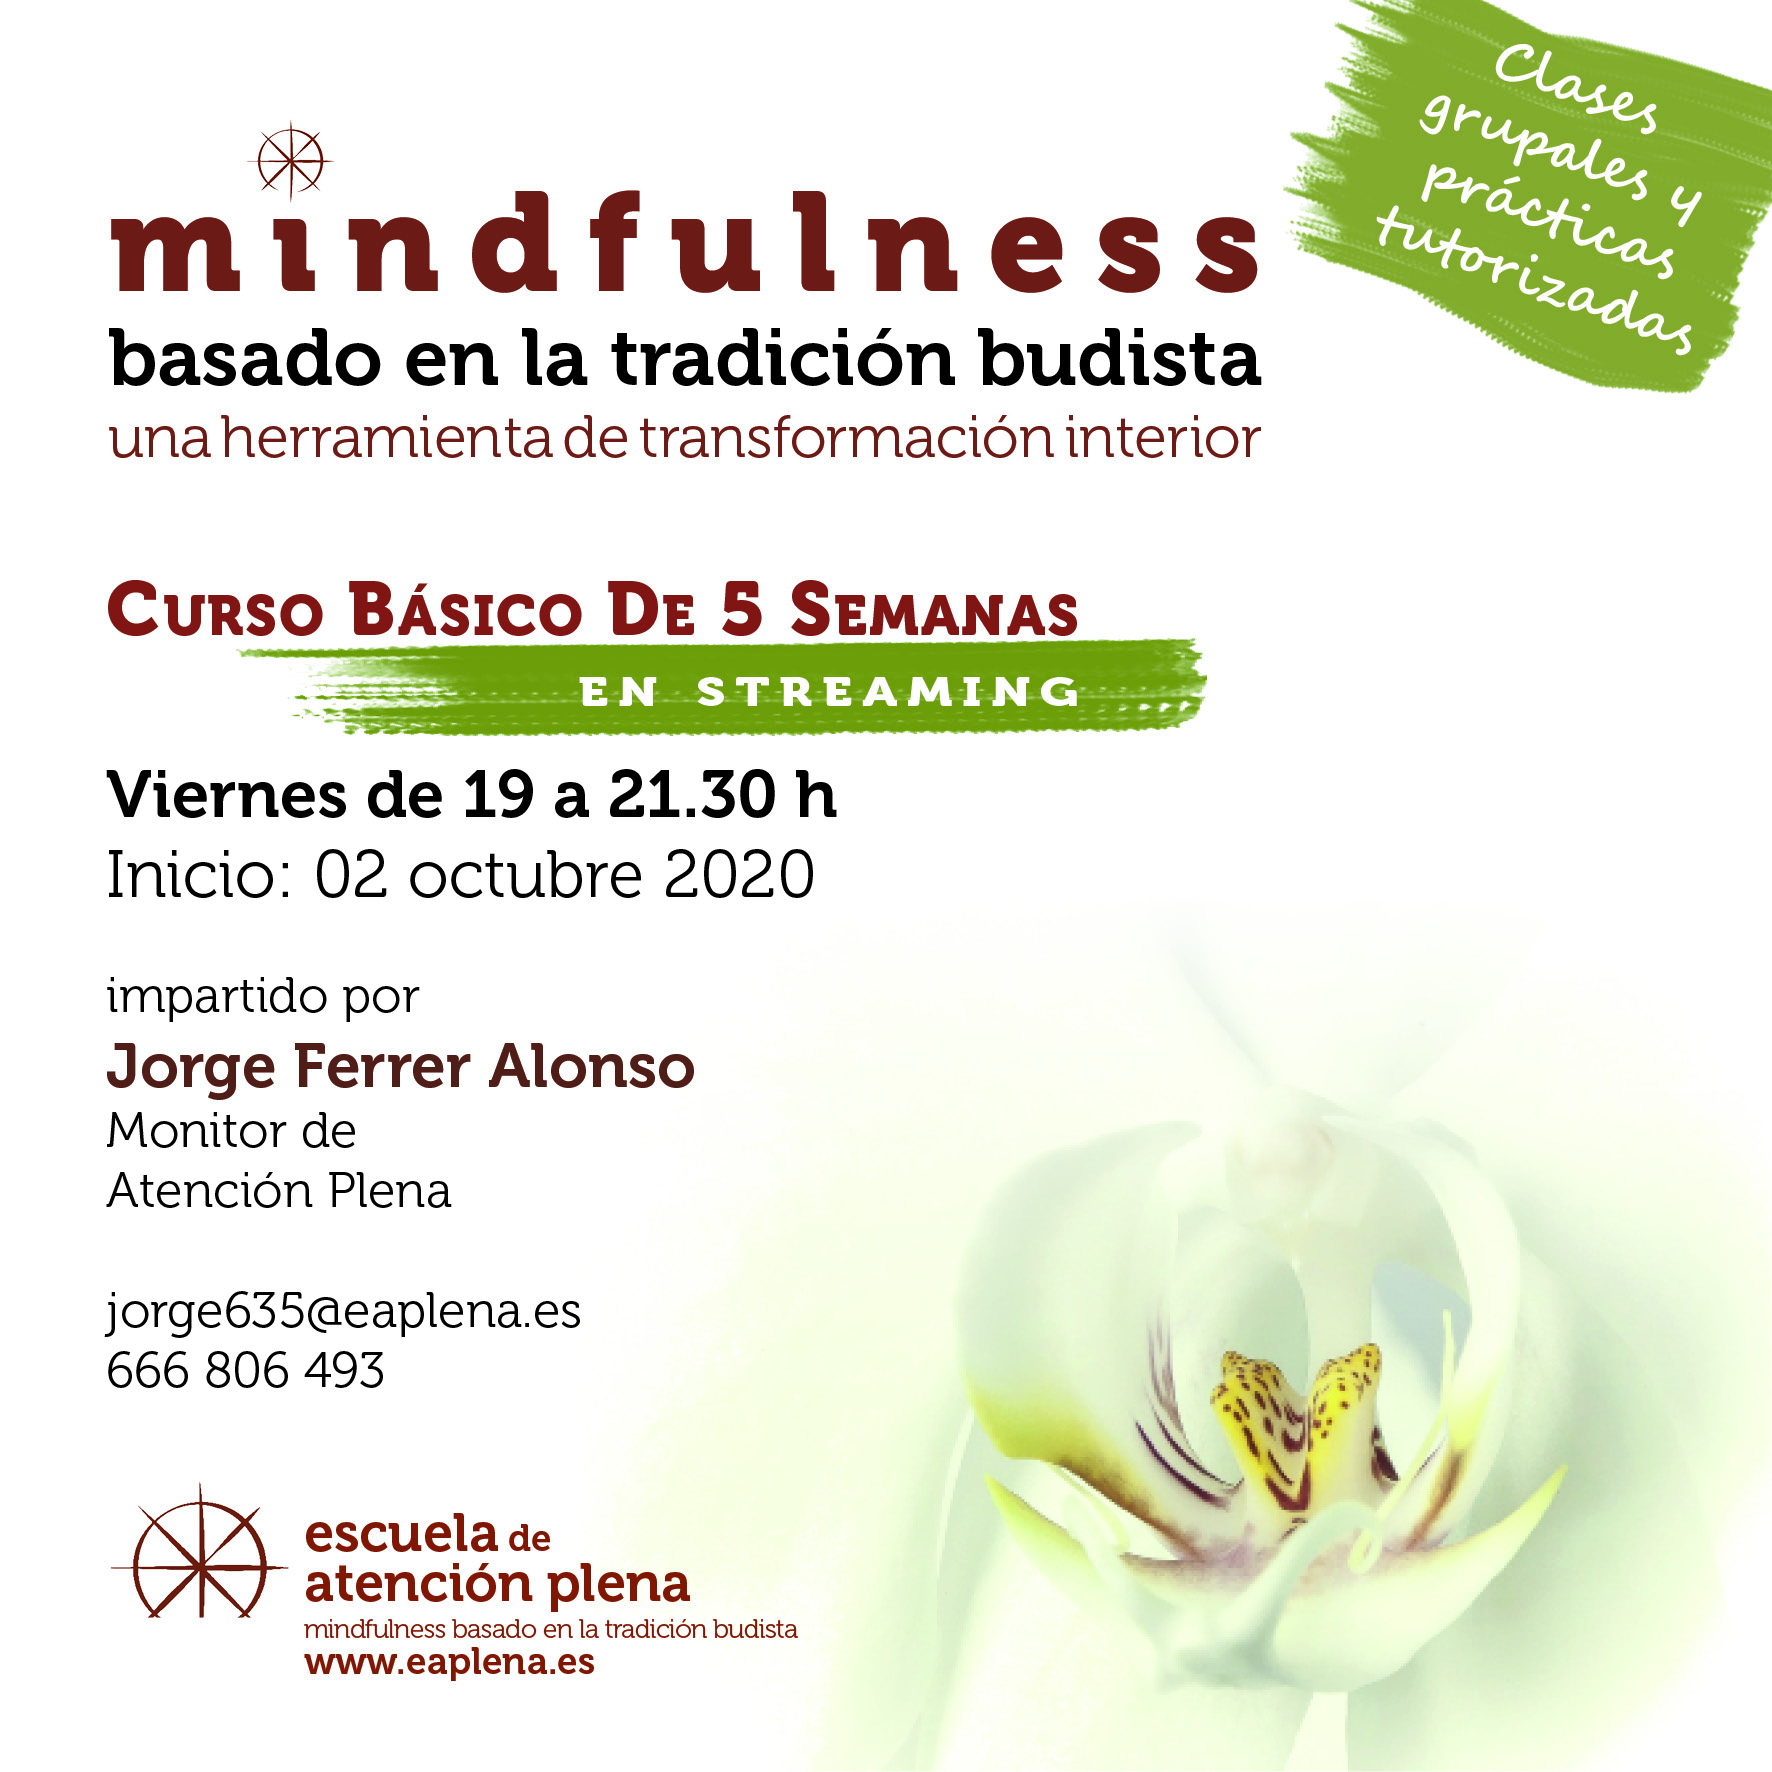 2020-10-02 Curso Básico de 5 Semanas en streaming 3 635 Ferrer Alonso Jorge